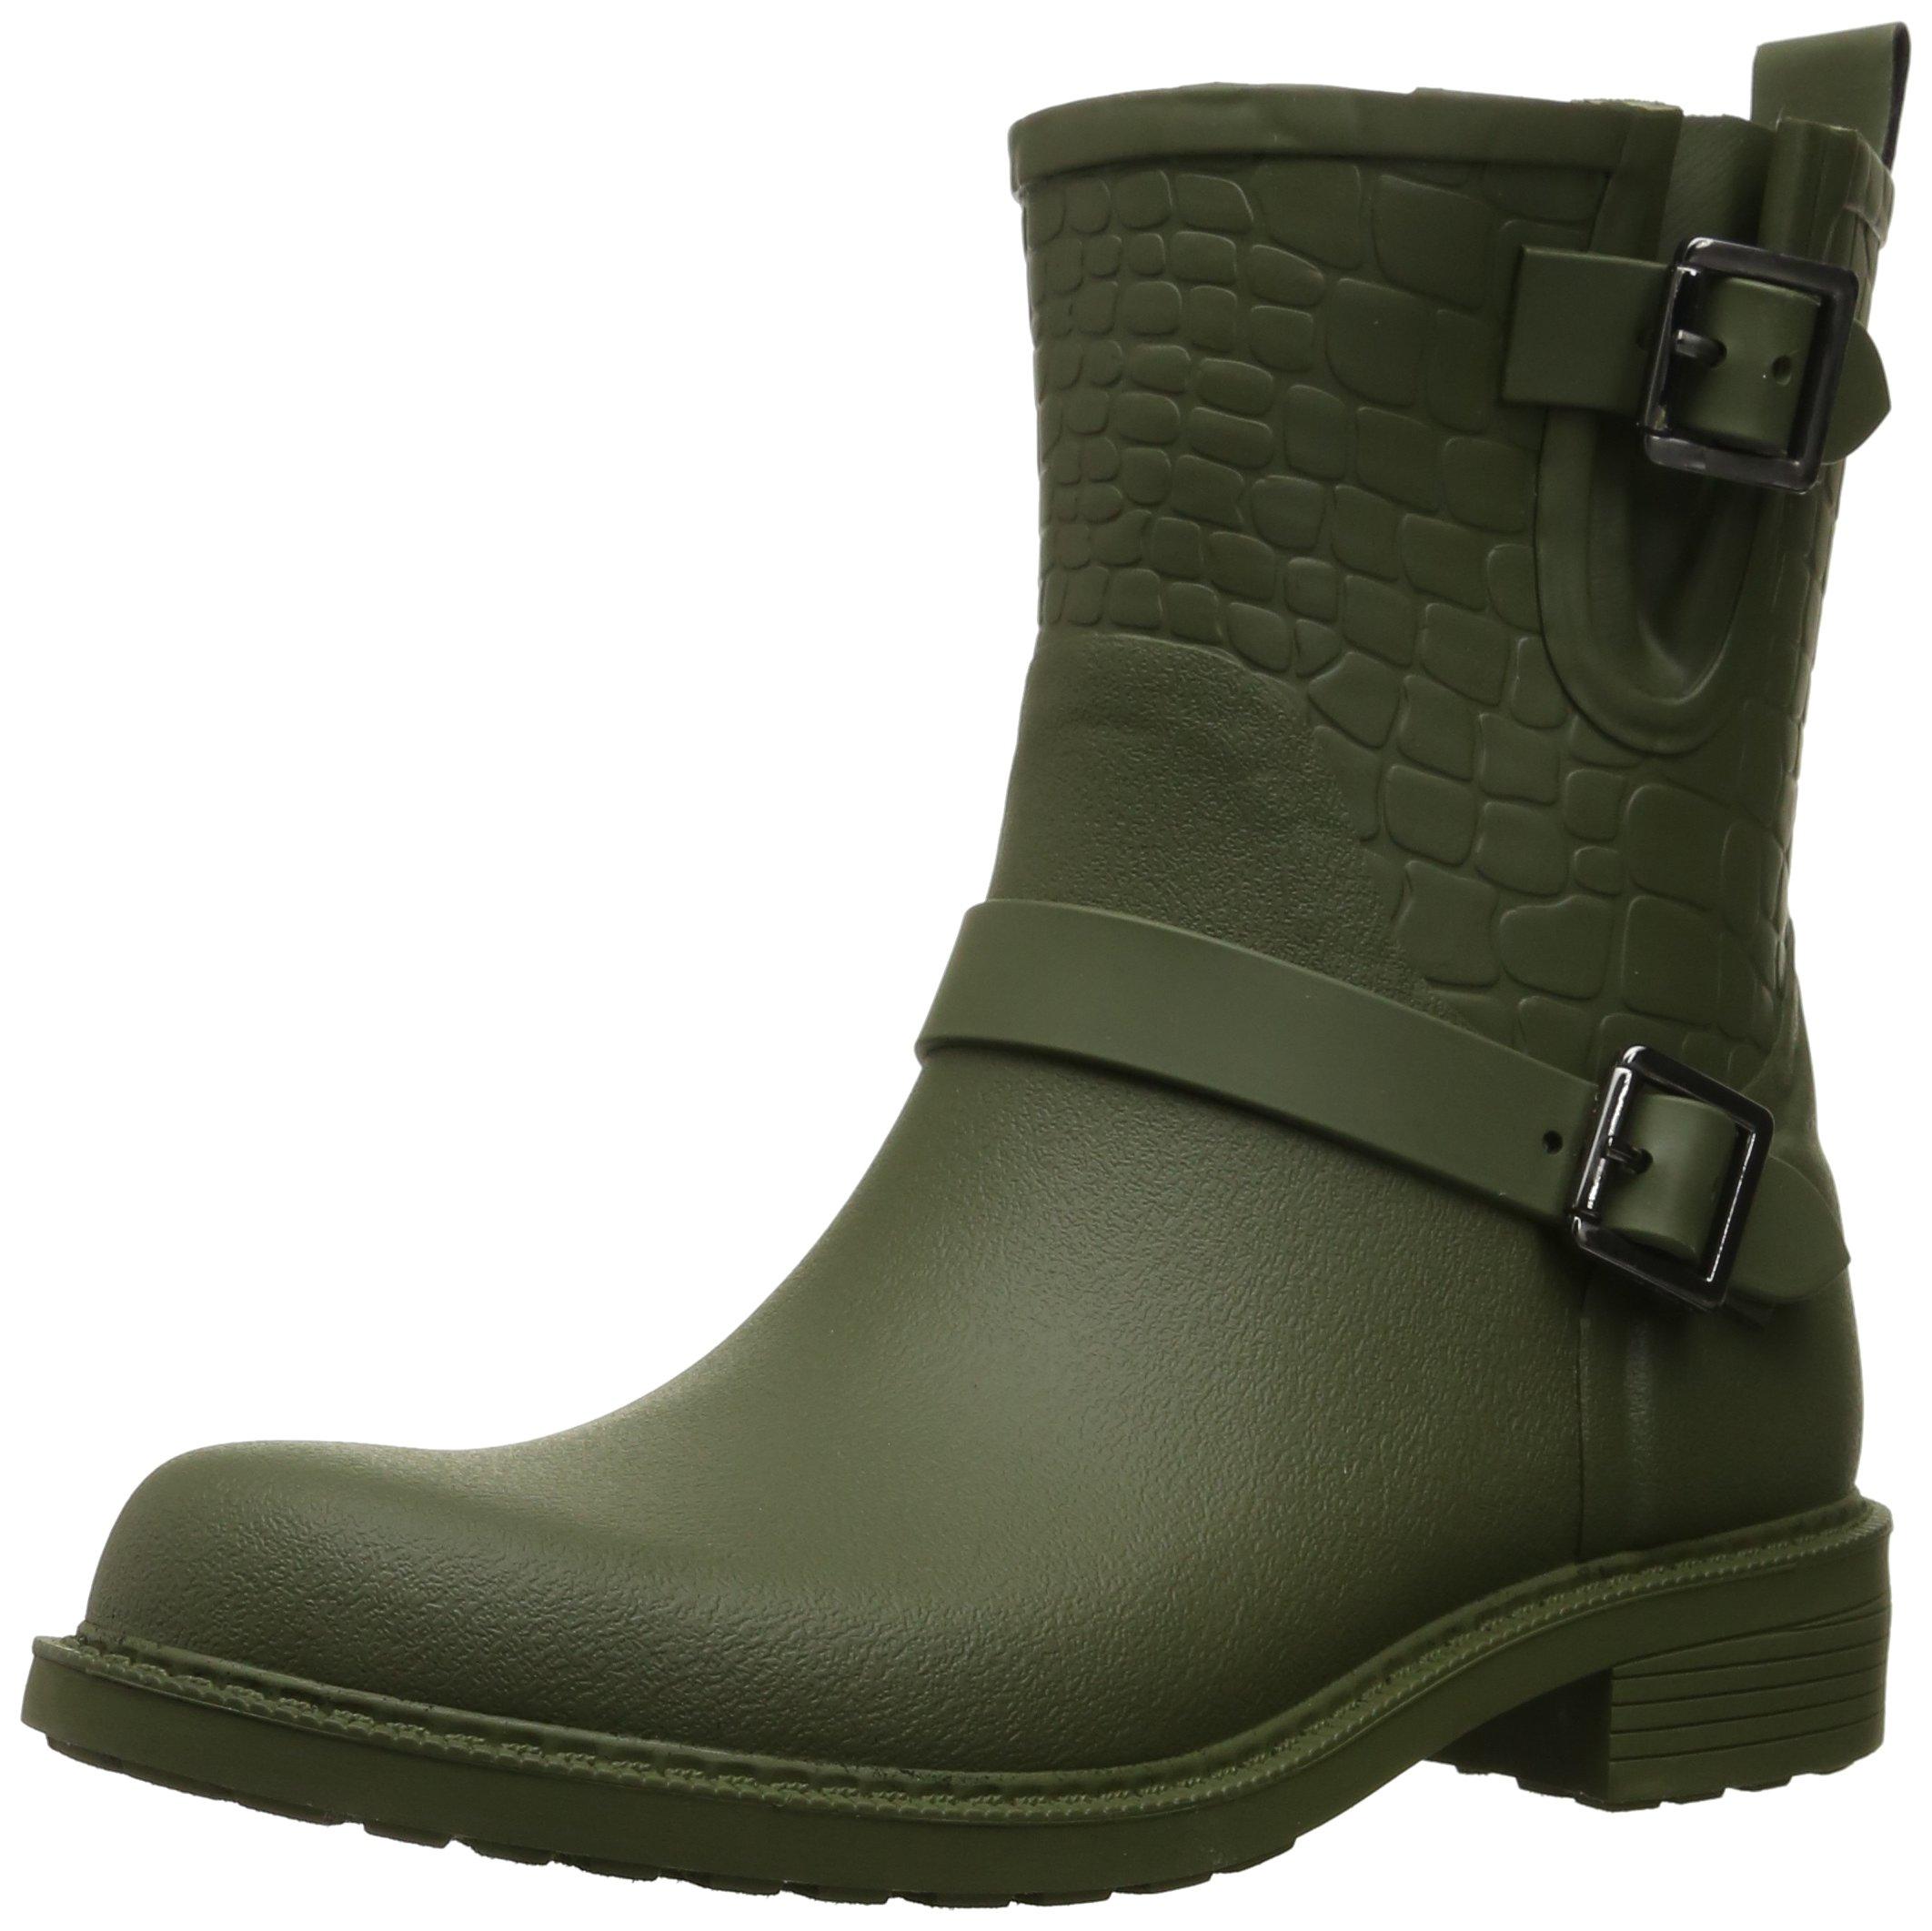 Sam Edelman Women's Keigan Rain Shoe, Forest Green, 7 M US